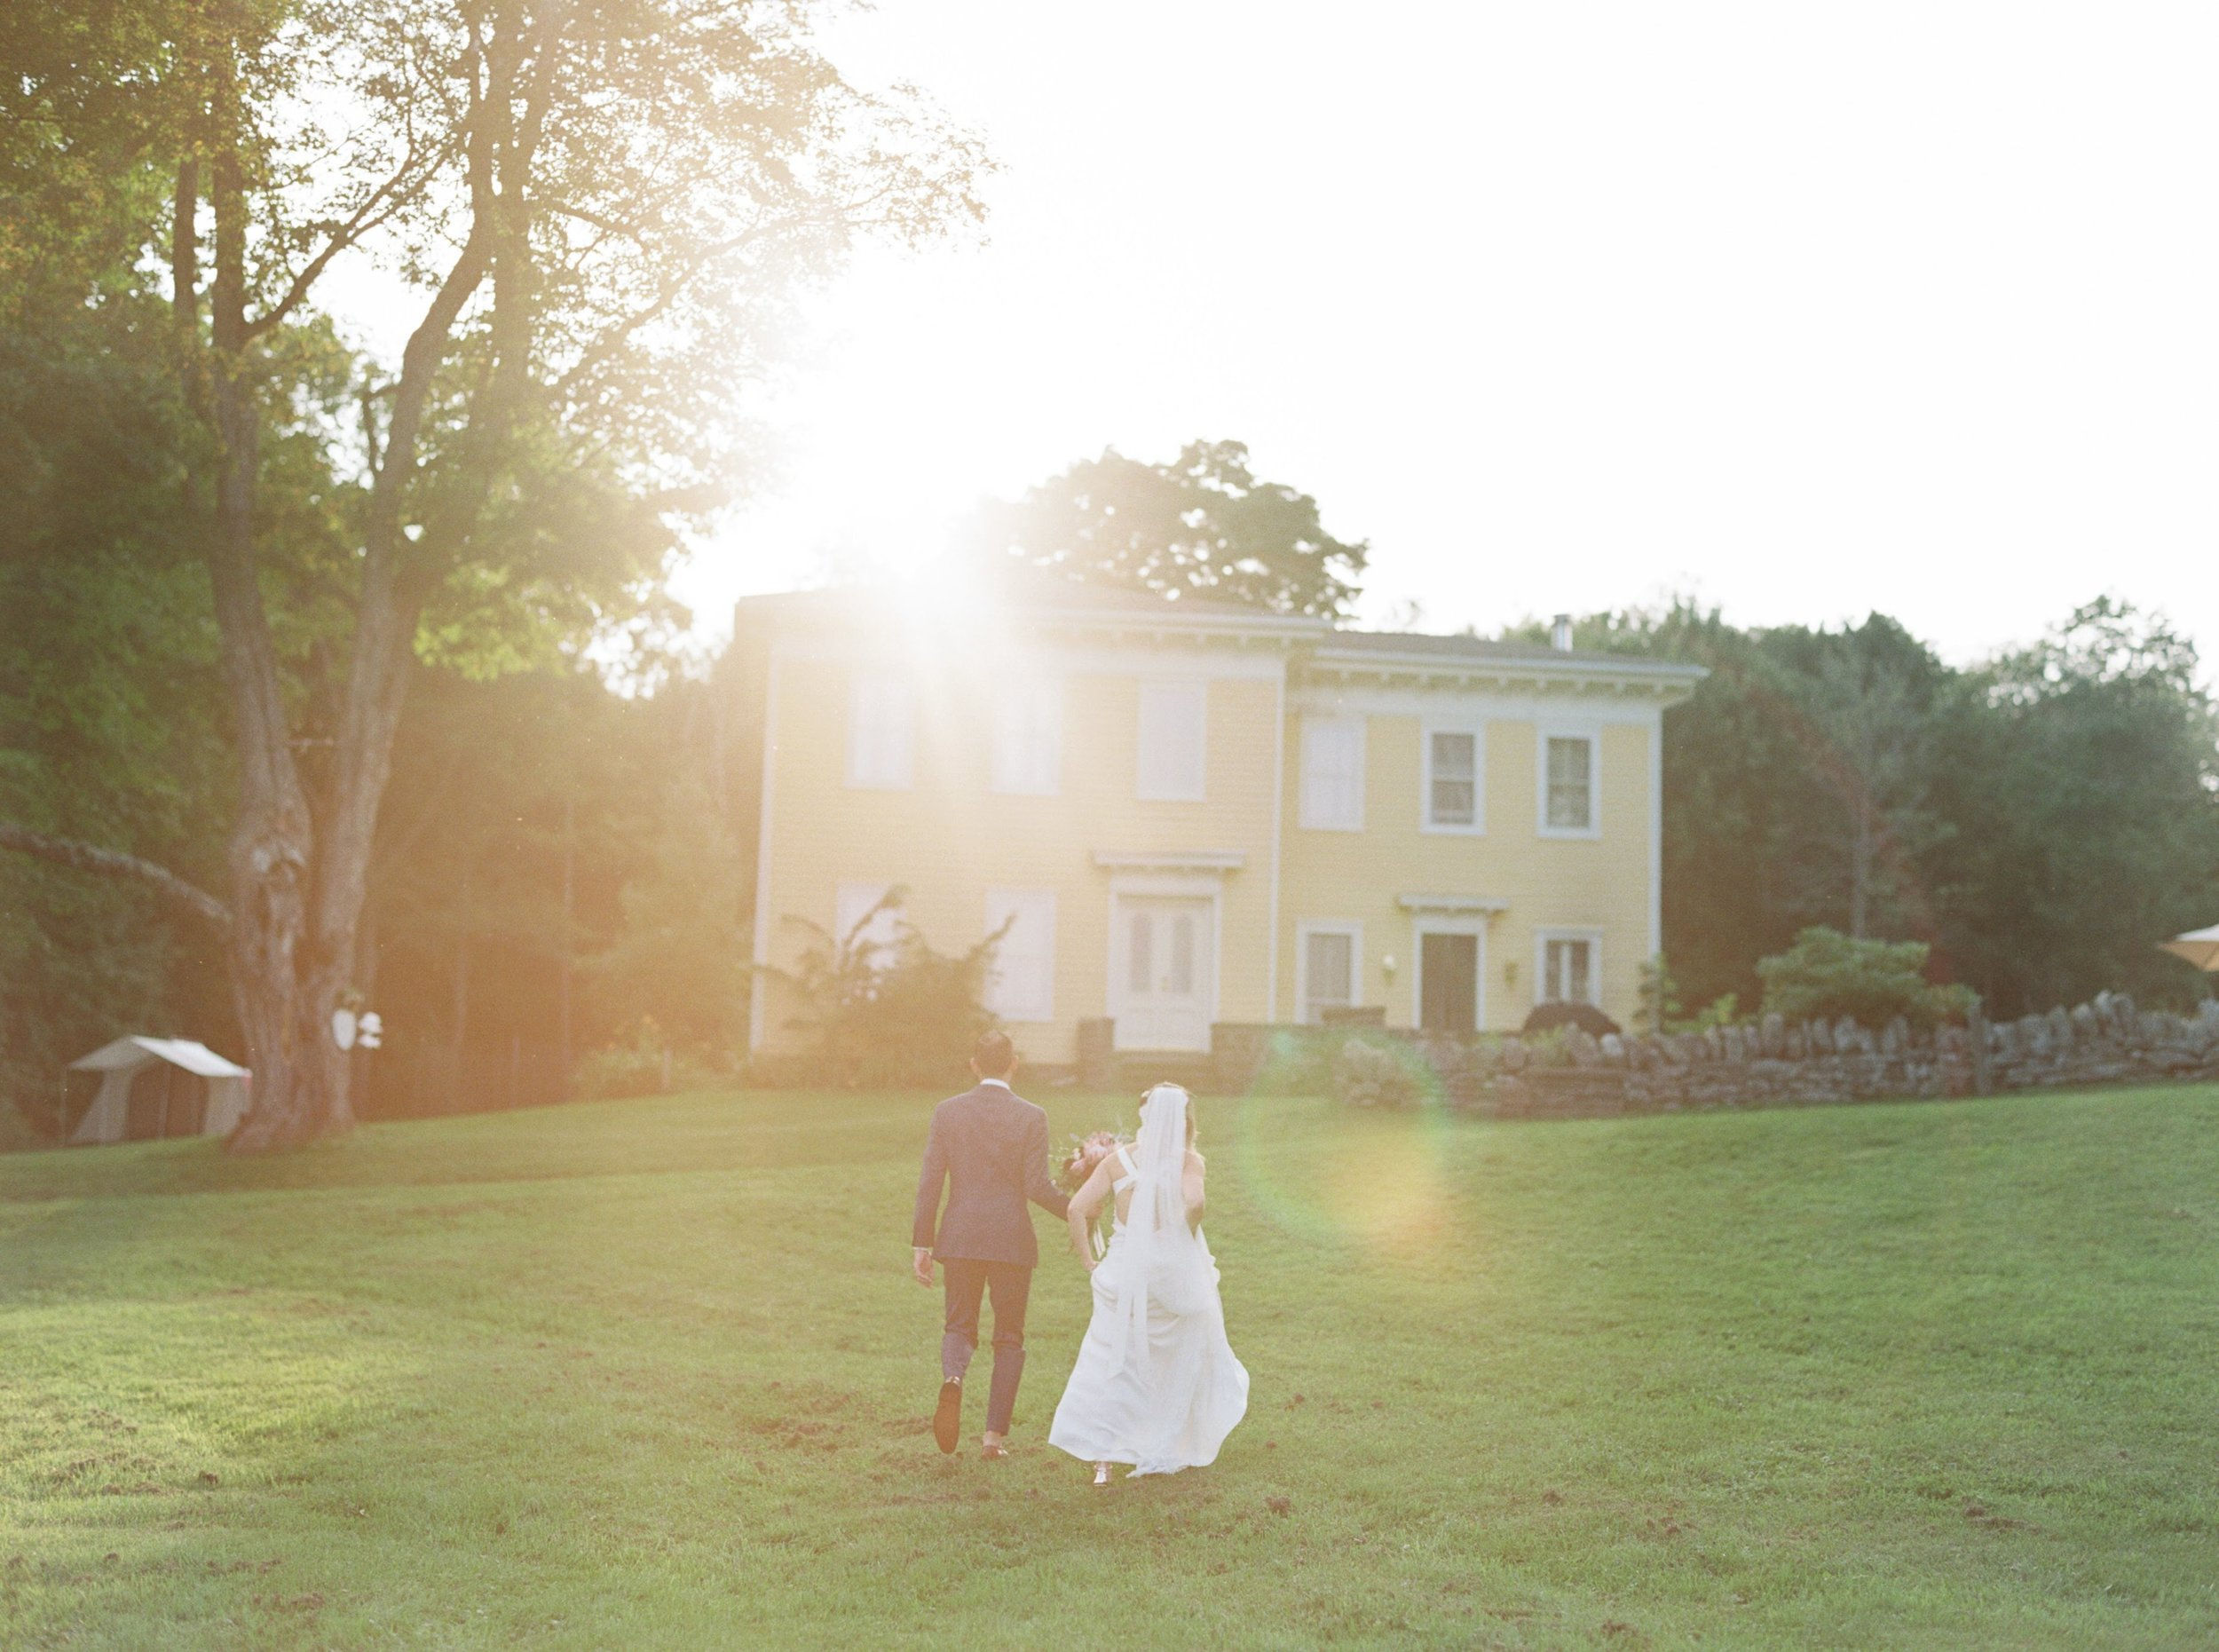 Courtney + Matt Blenheim Hill Farm Catskills NY Wedding Veronica Lola Photography 2017-442.jpg